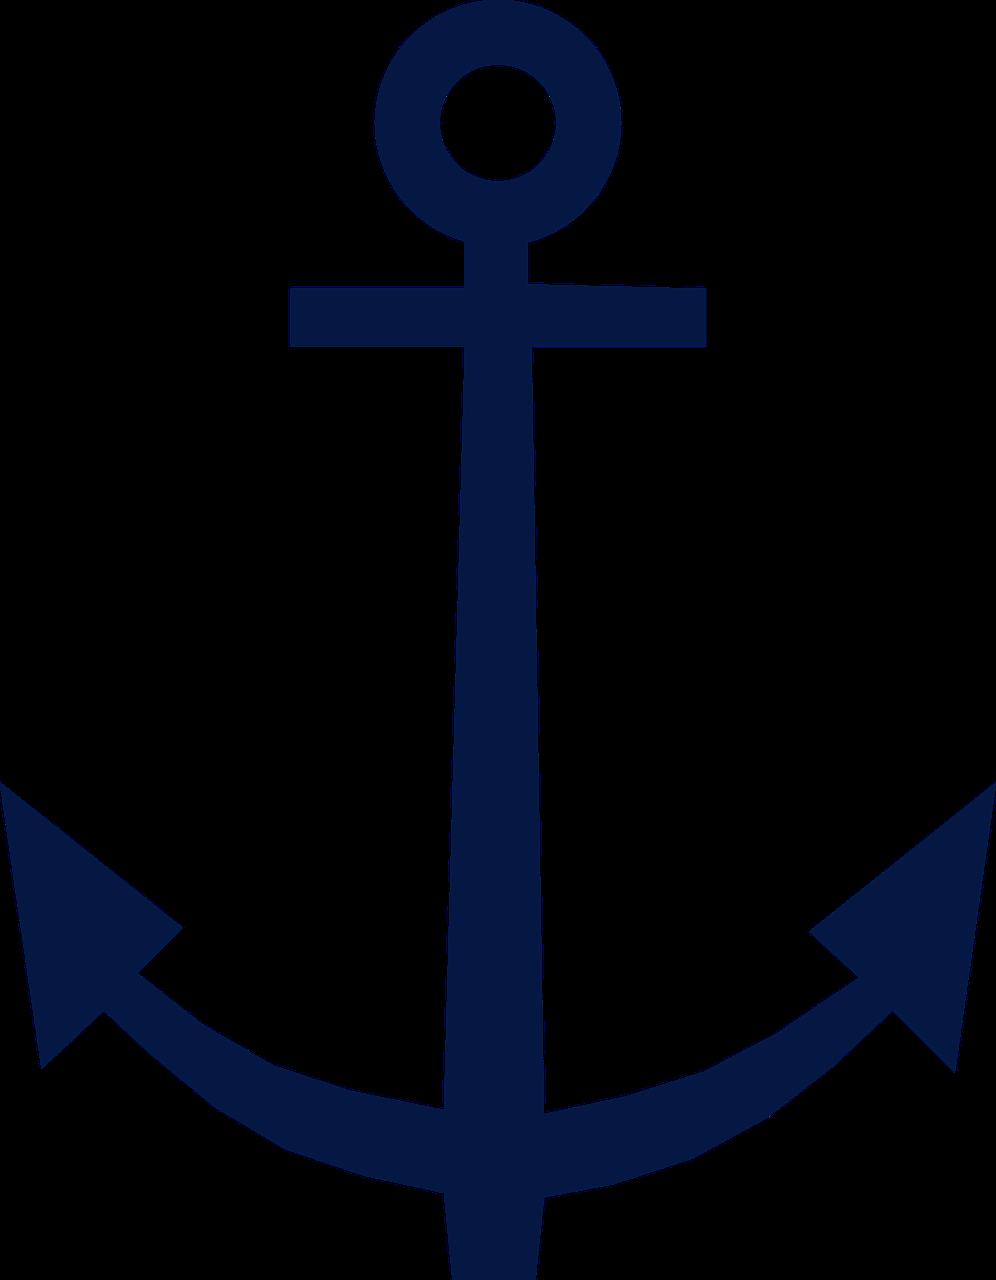 Blue symbol design png. Clipart anchor navy